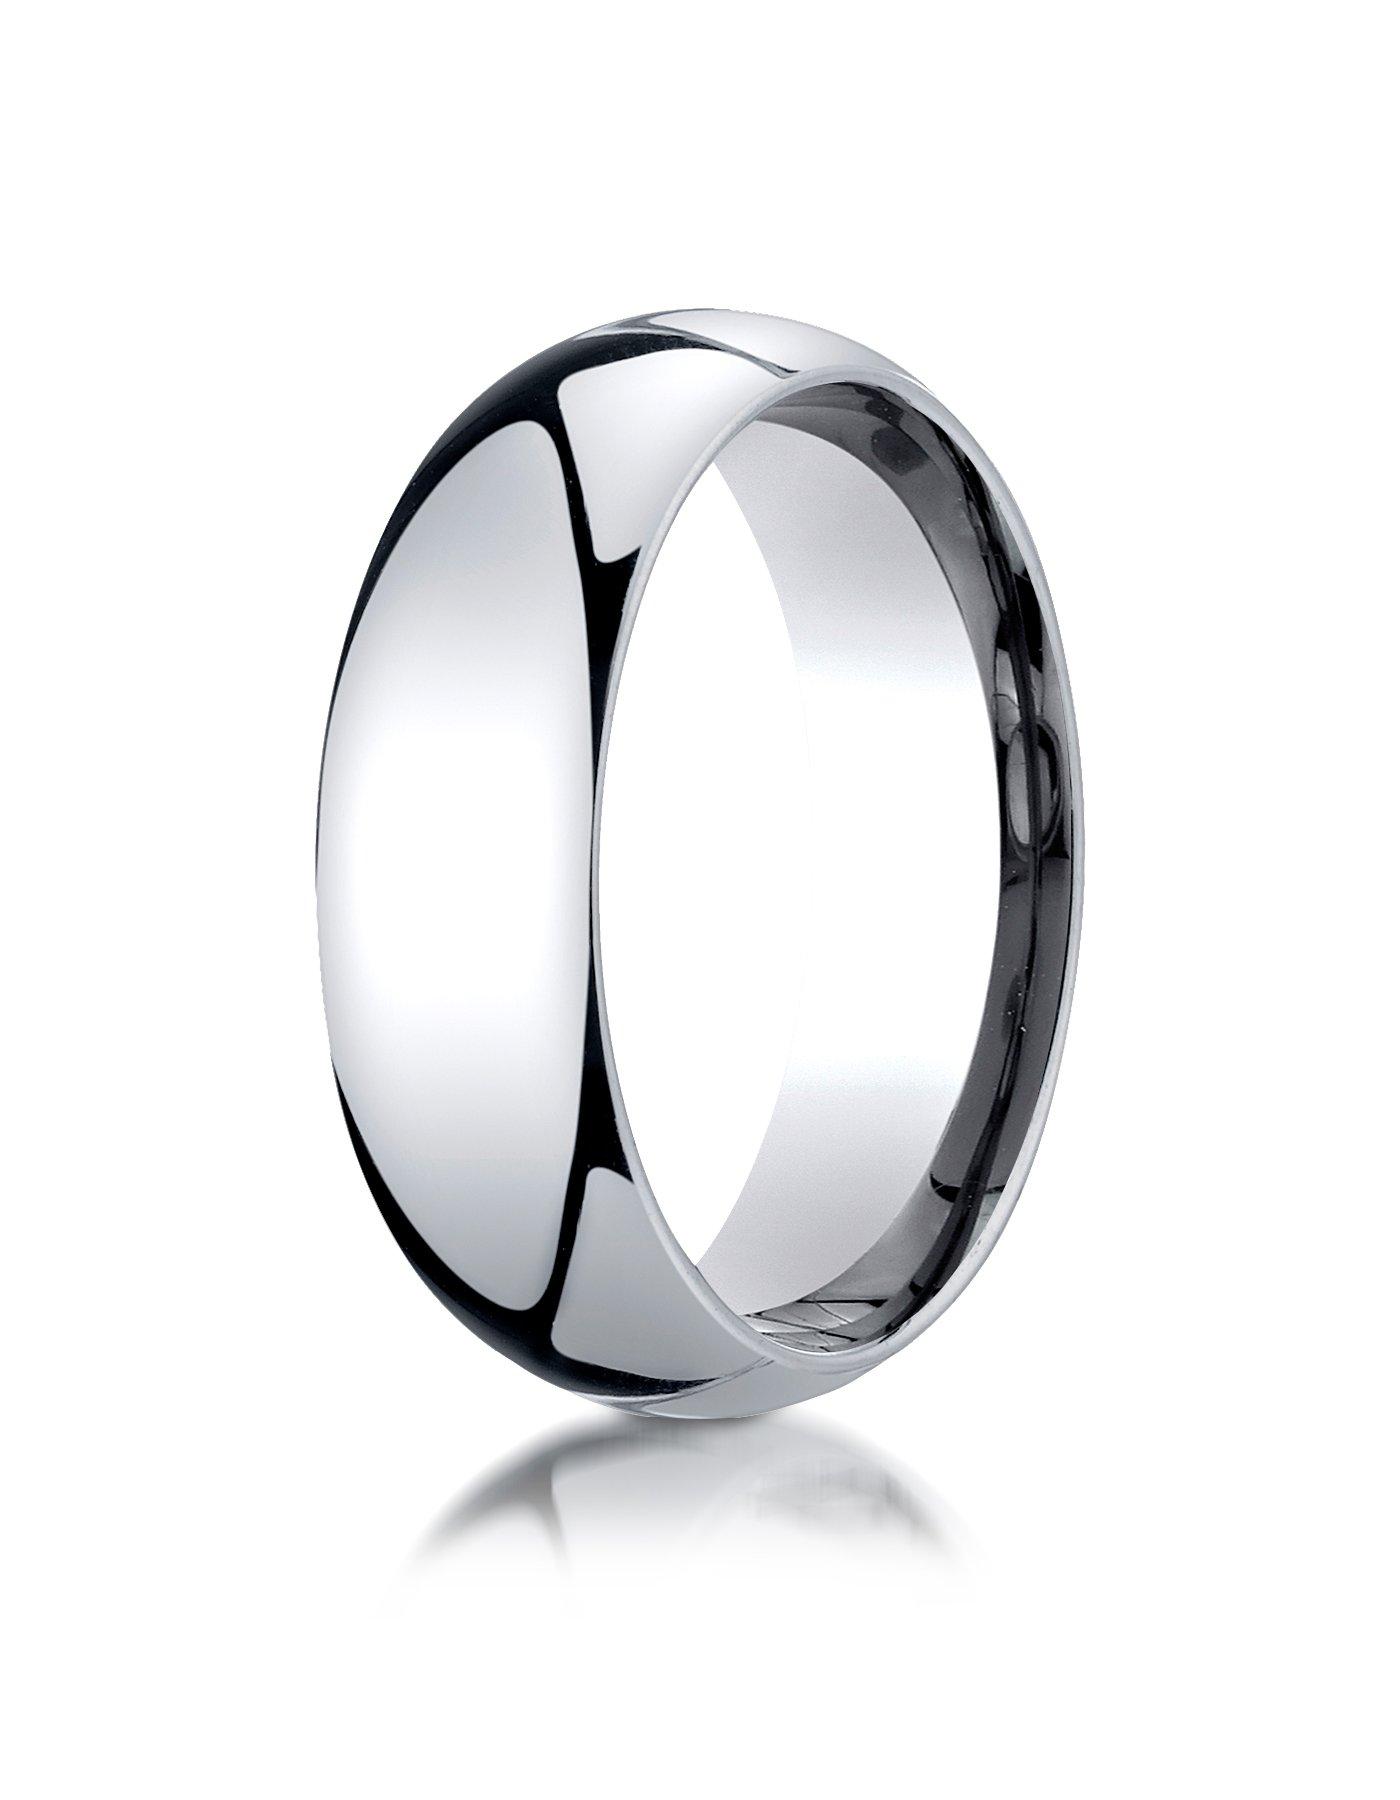 Womens Platinum, 7mm Slim Profile Comfort-Fit Ring (sz 7)